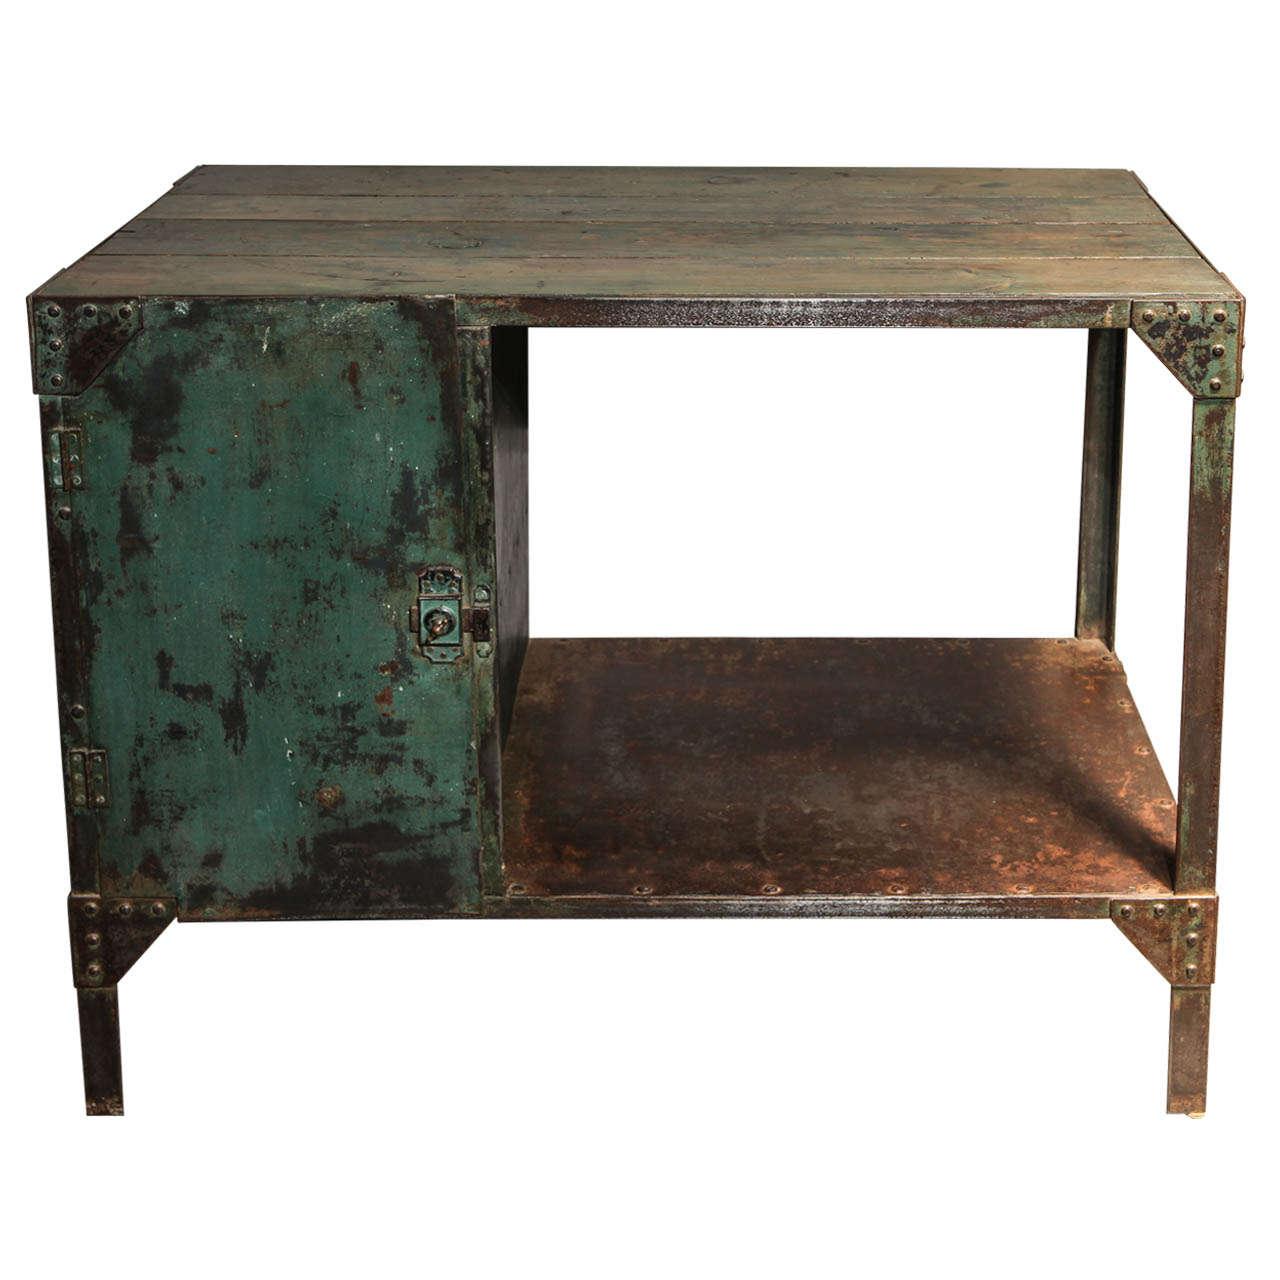 a painted metal sideboard at 1stdibs. Black Bedroom Furniture Sets. Home Design Ideas